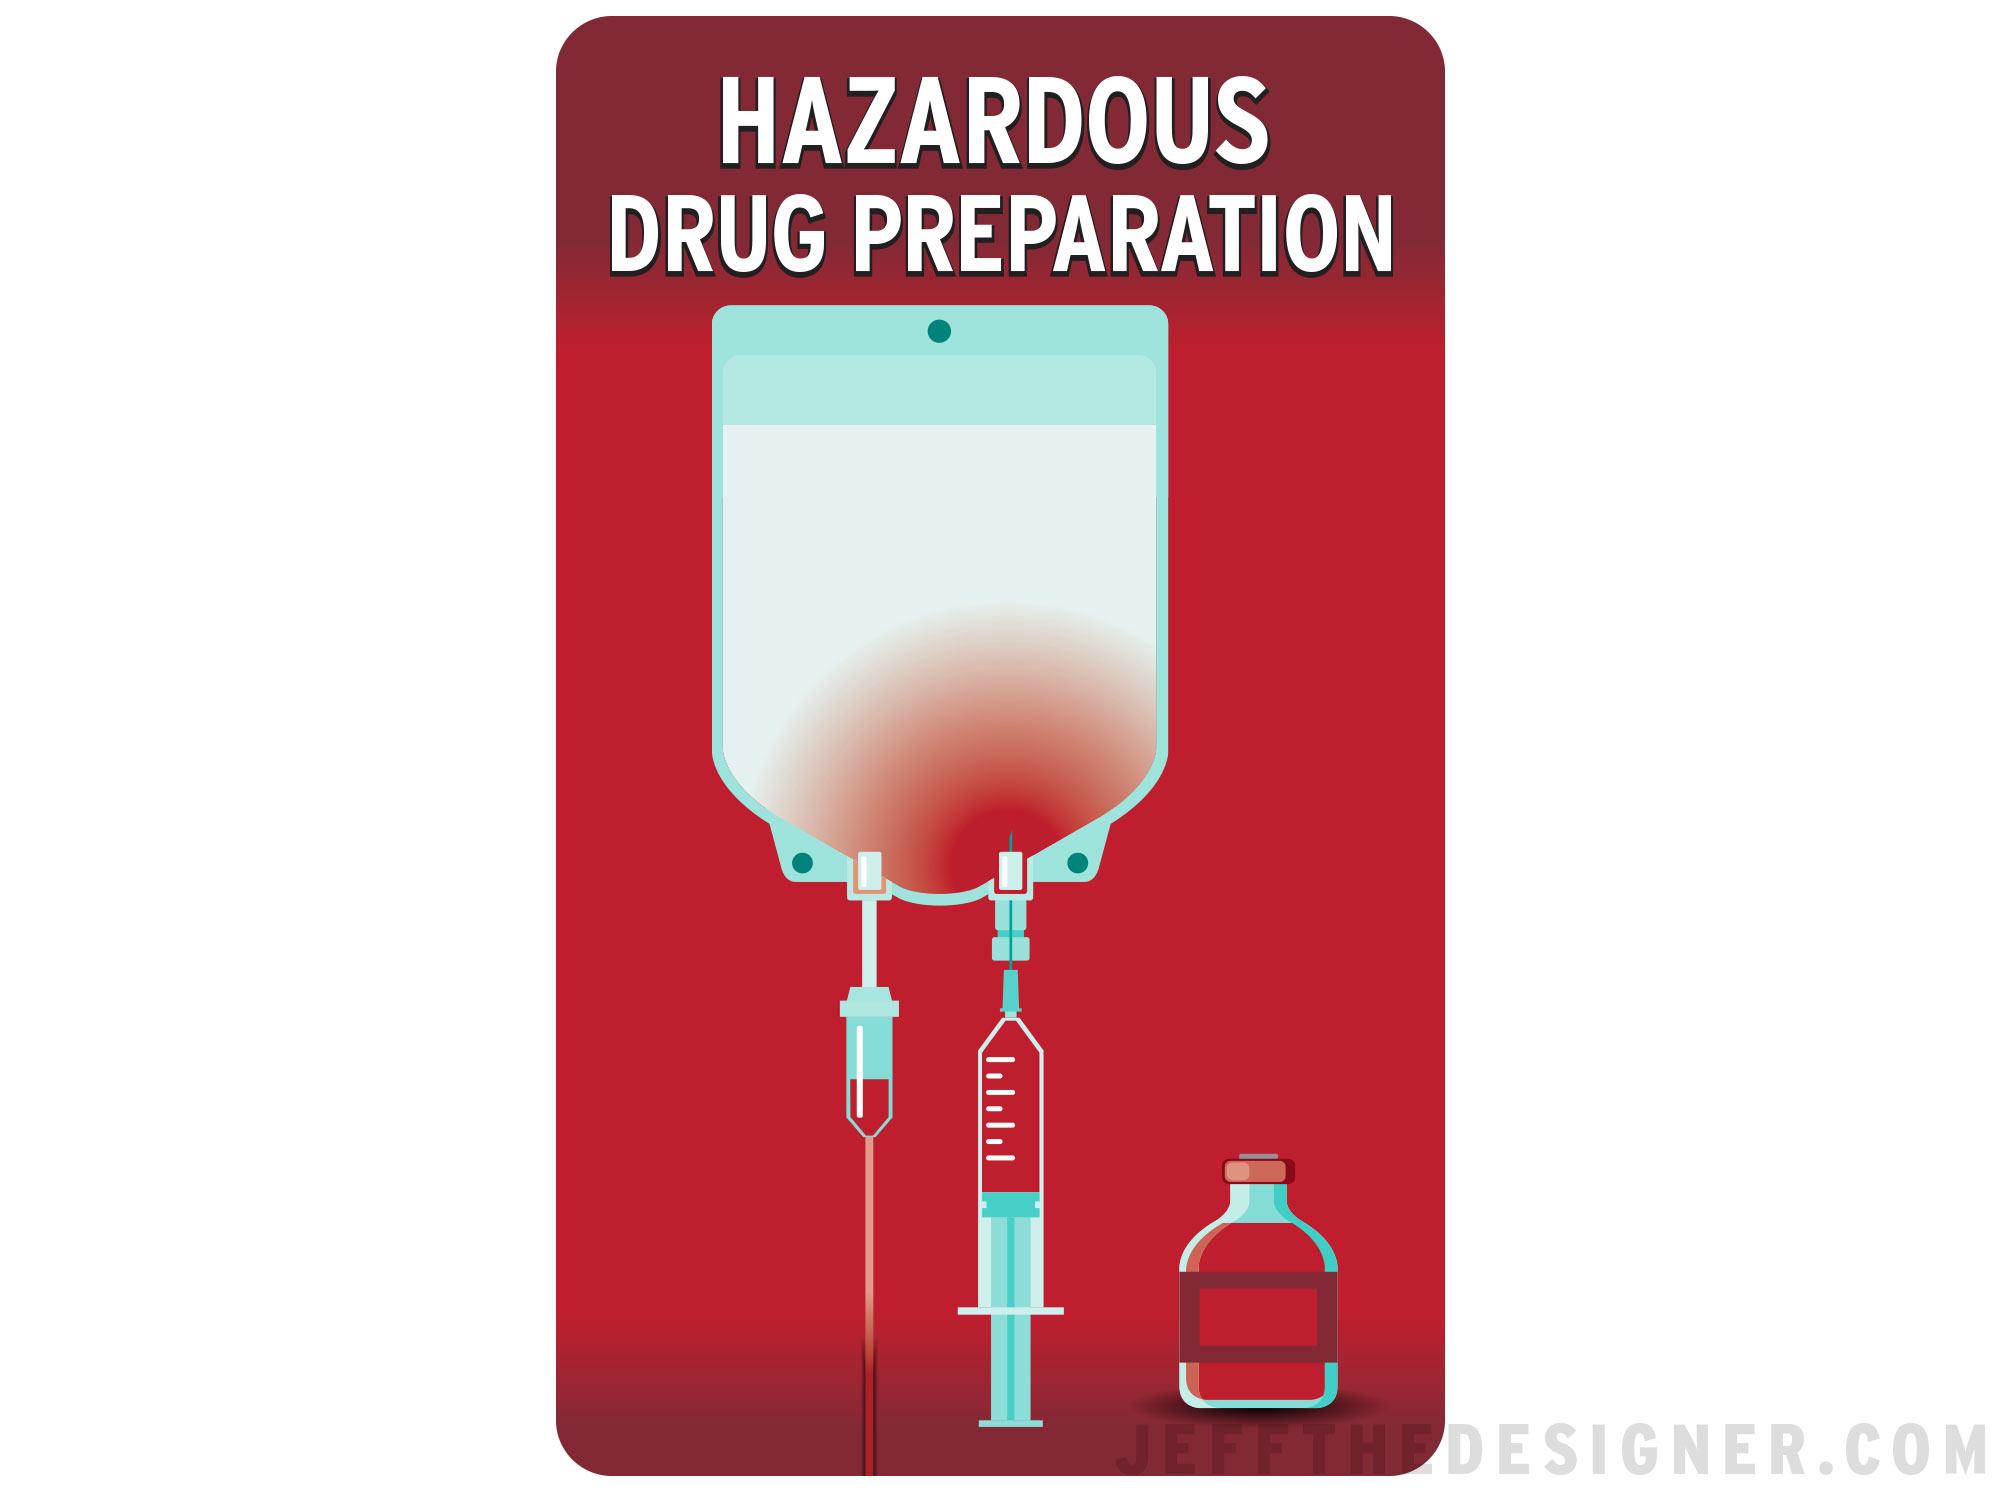 Hazardous Drug Preparation Graphics